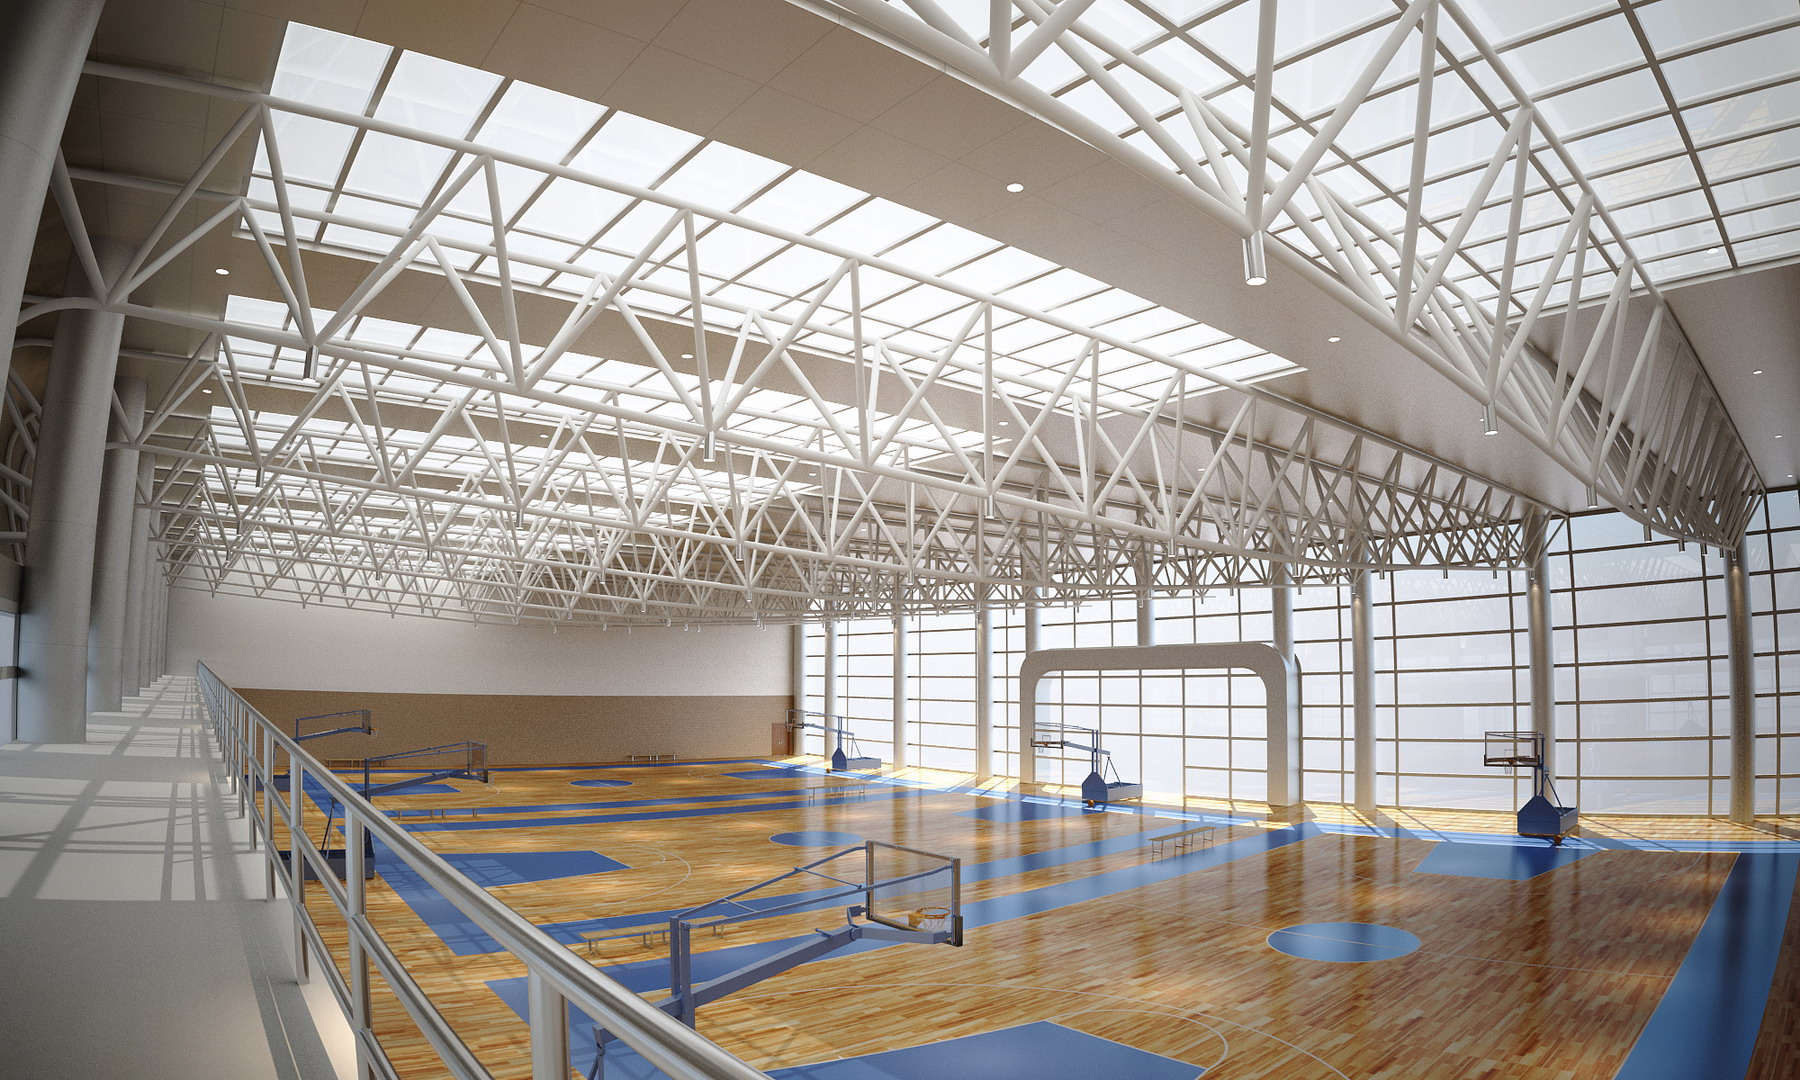 Basketball gymnasium arena 3d model buy basketball for Basketball gym designs and layout